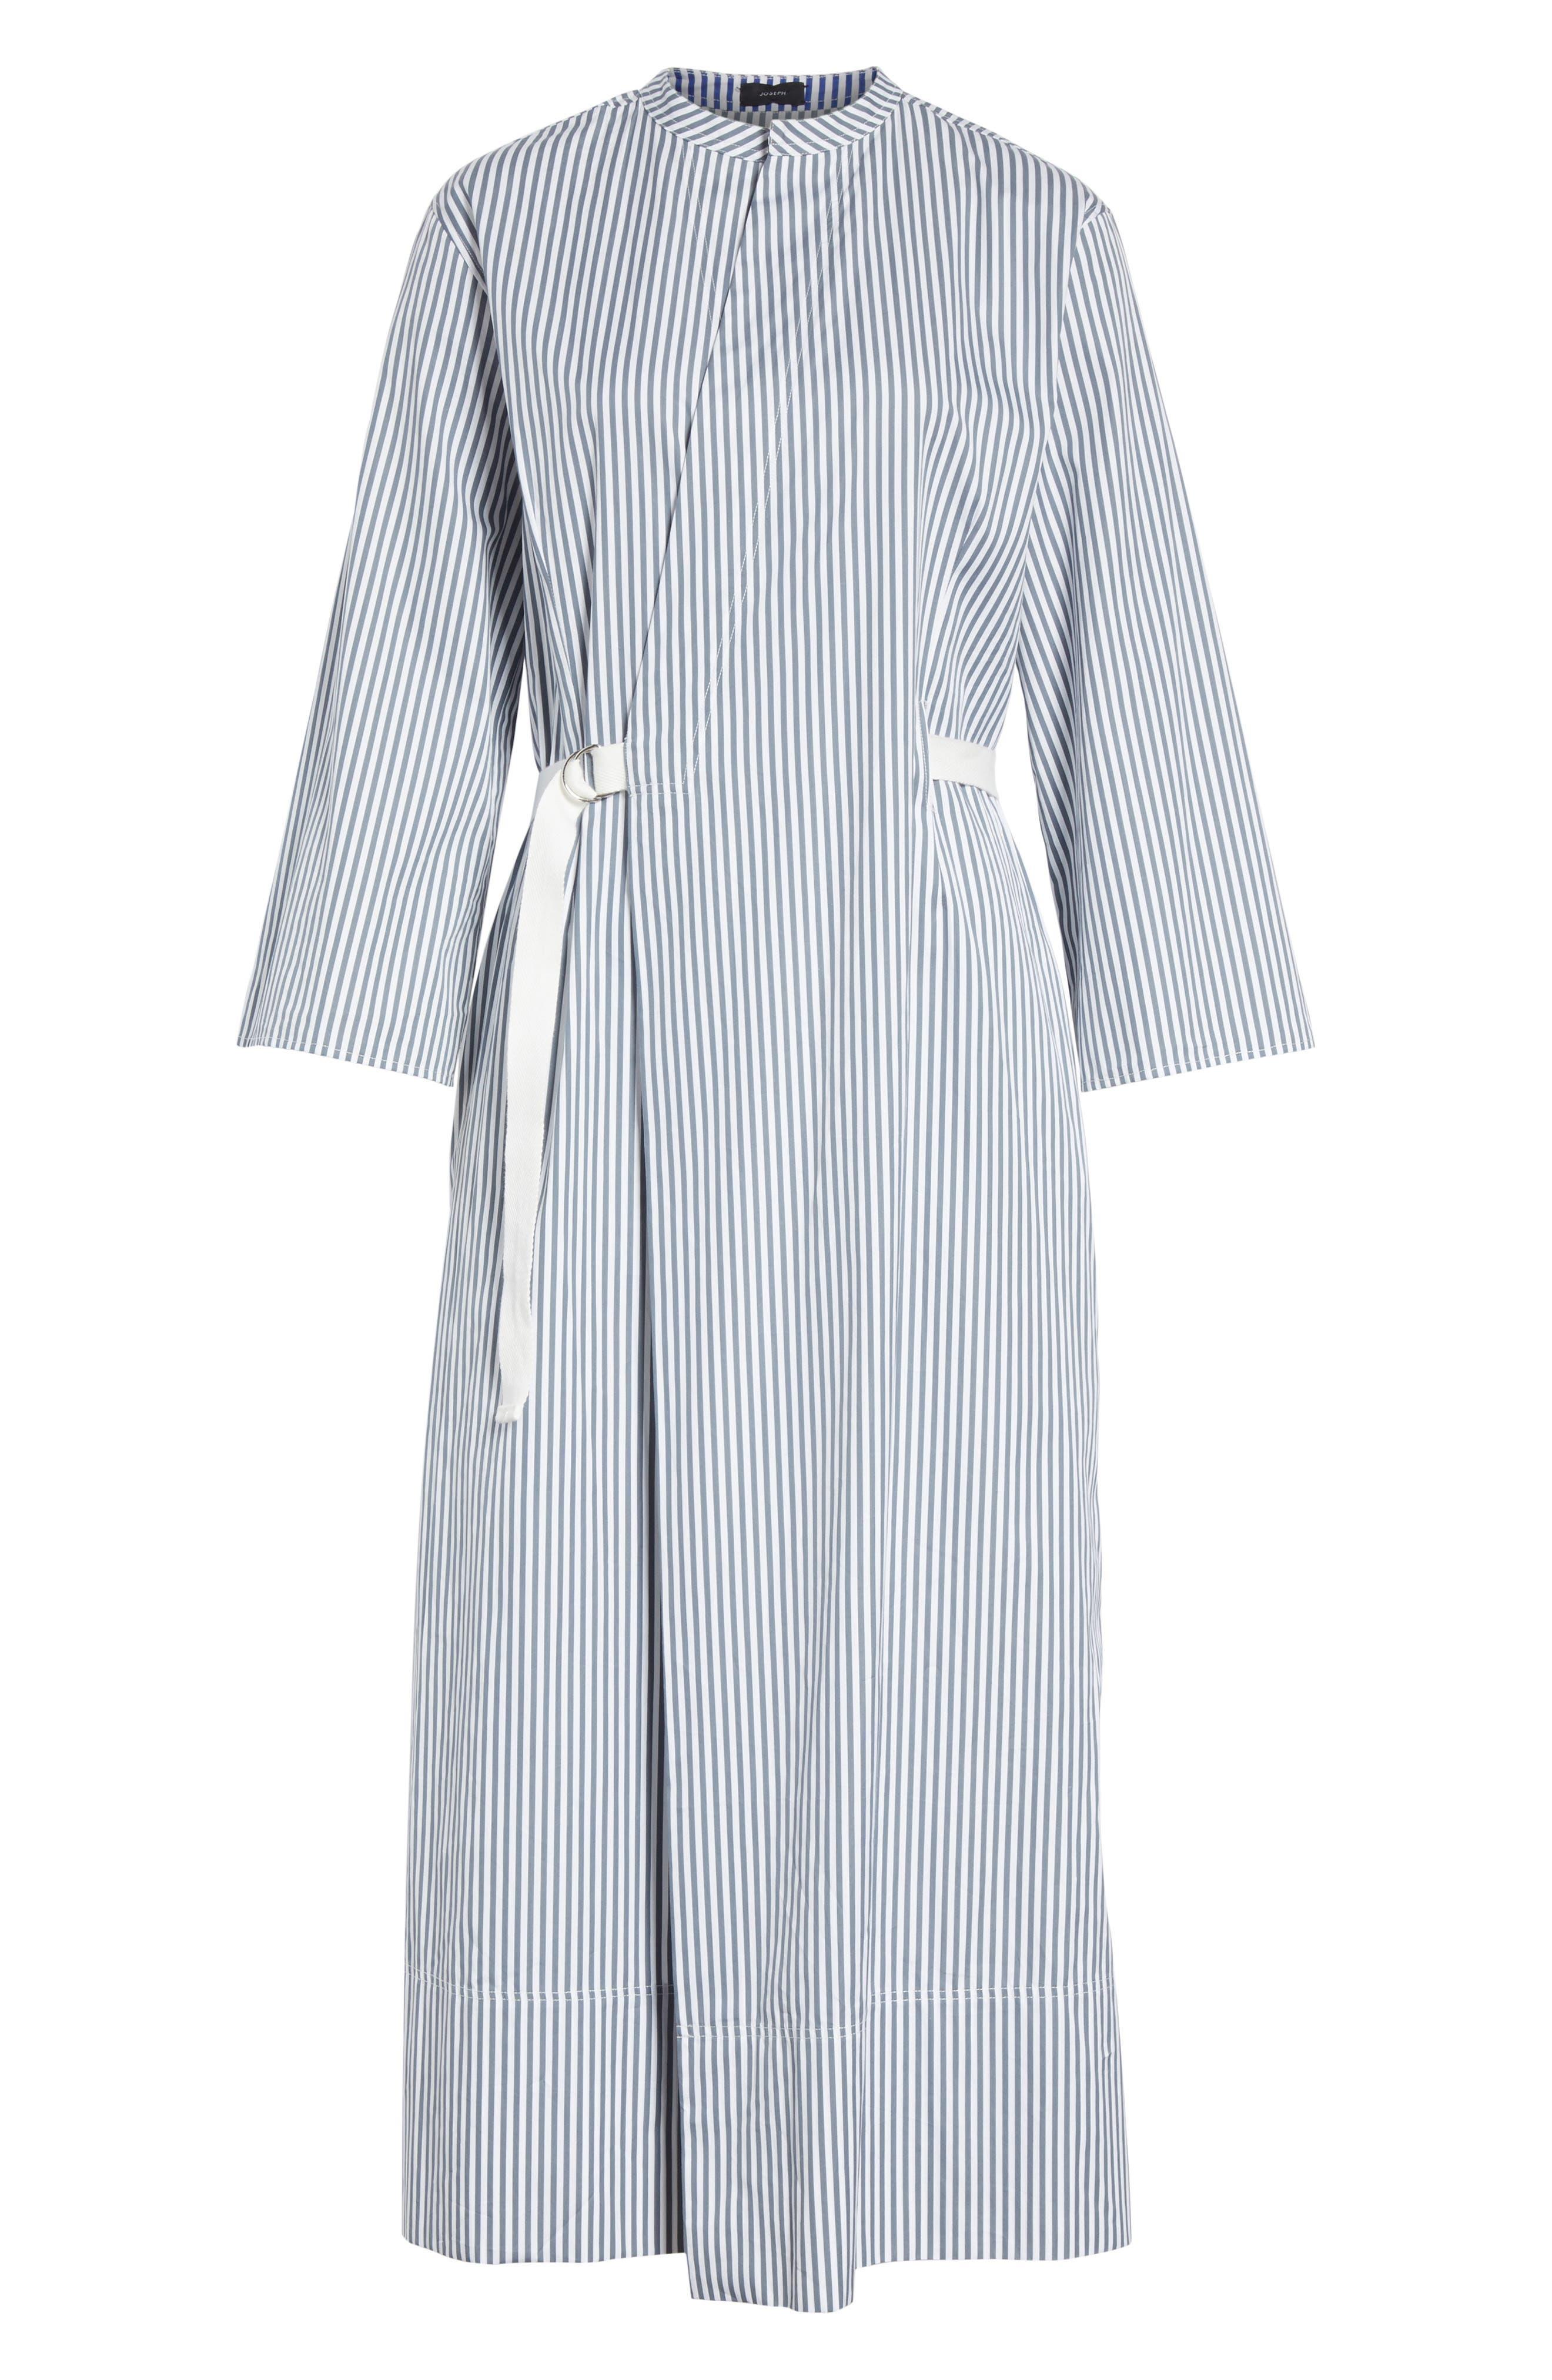 Candy Stripe Midi Dress,                             Alternate thumbnail 6, color,                             Ink